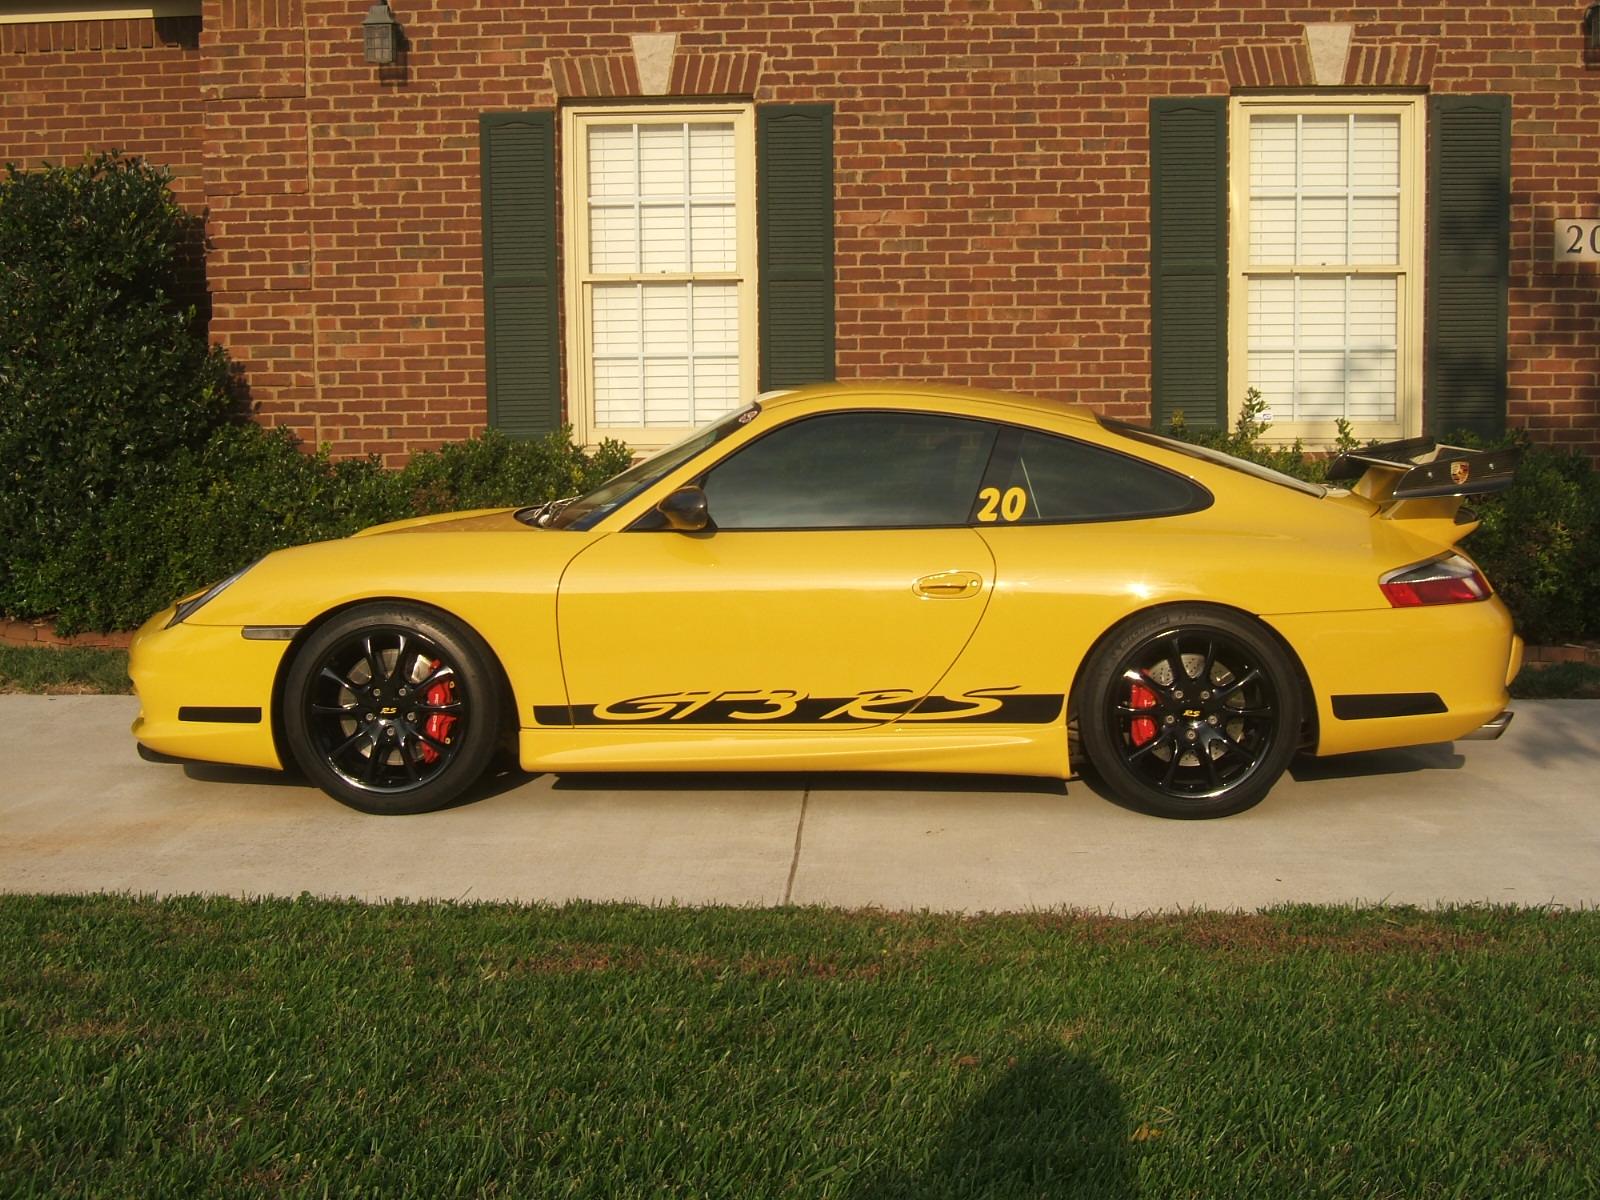 2004-Porsche-911996-GT3-RS Terrific 2002 Porsche 911 Carrera Turbo Gt2 X50 Cars Trend